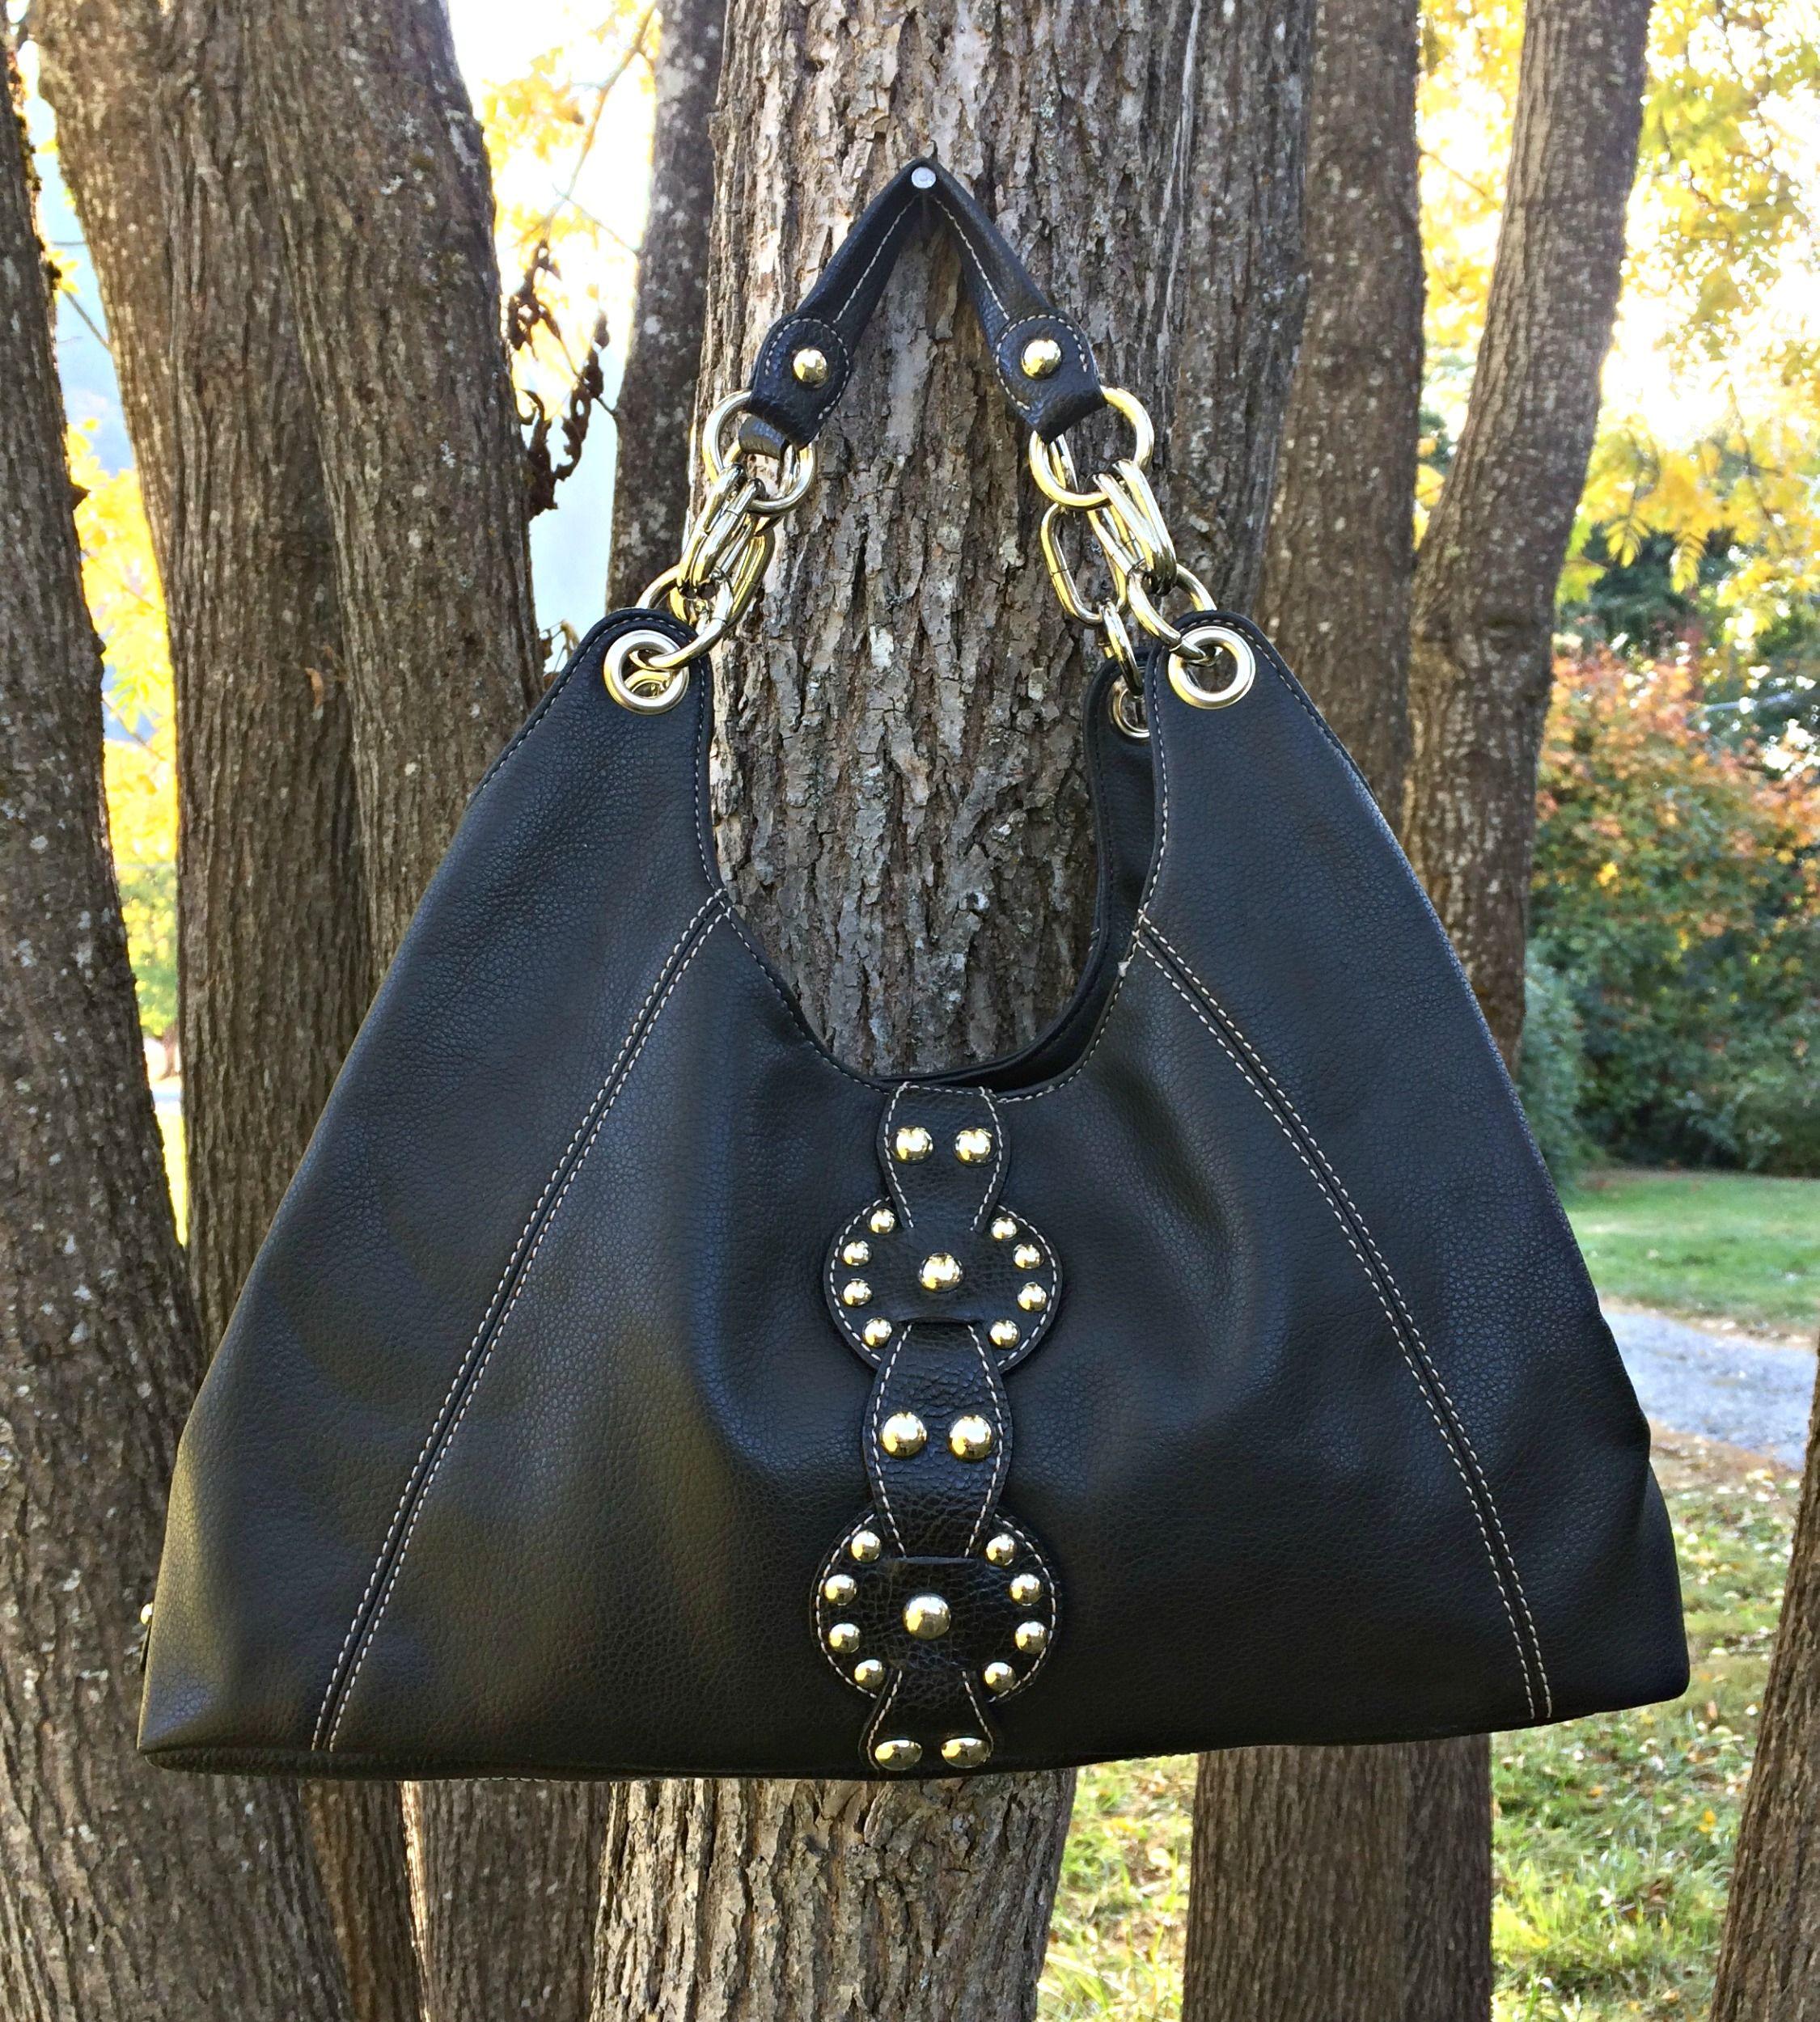 Black Leather Purse Handbag Faux With Silver Tone Hardware